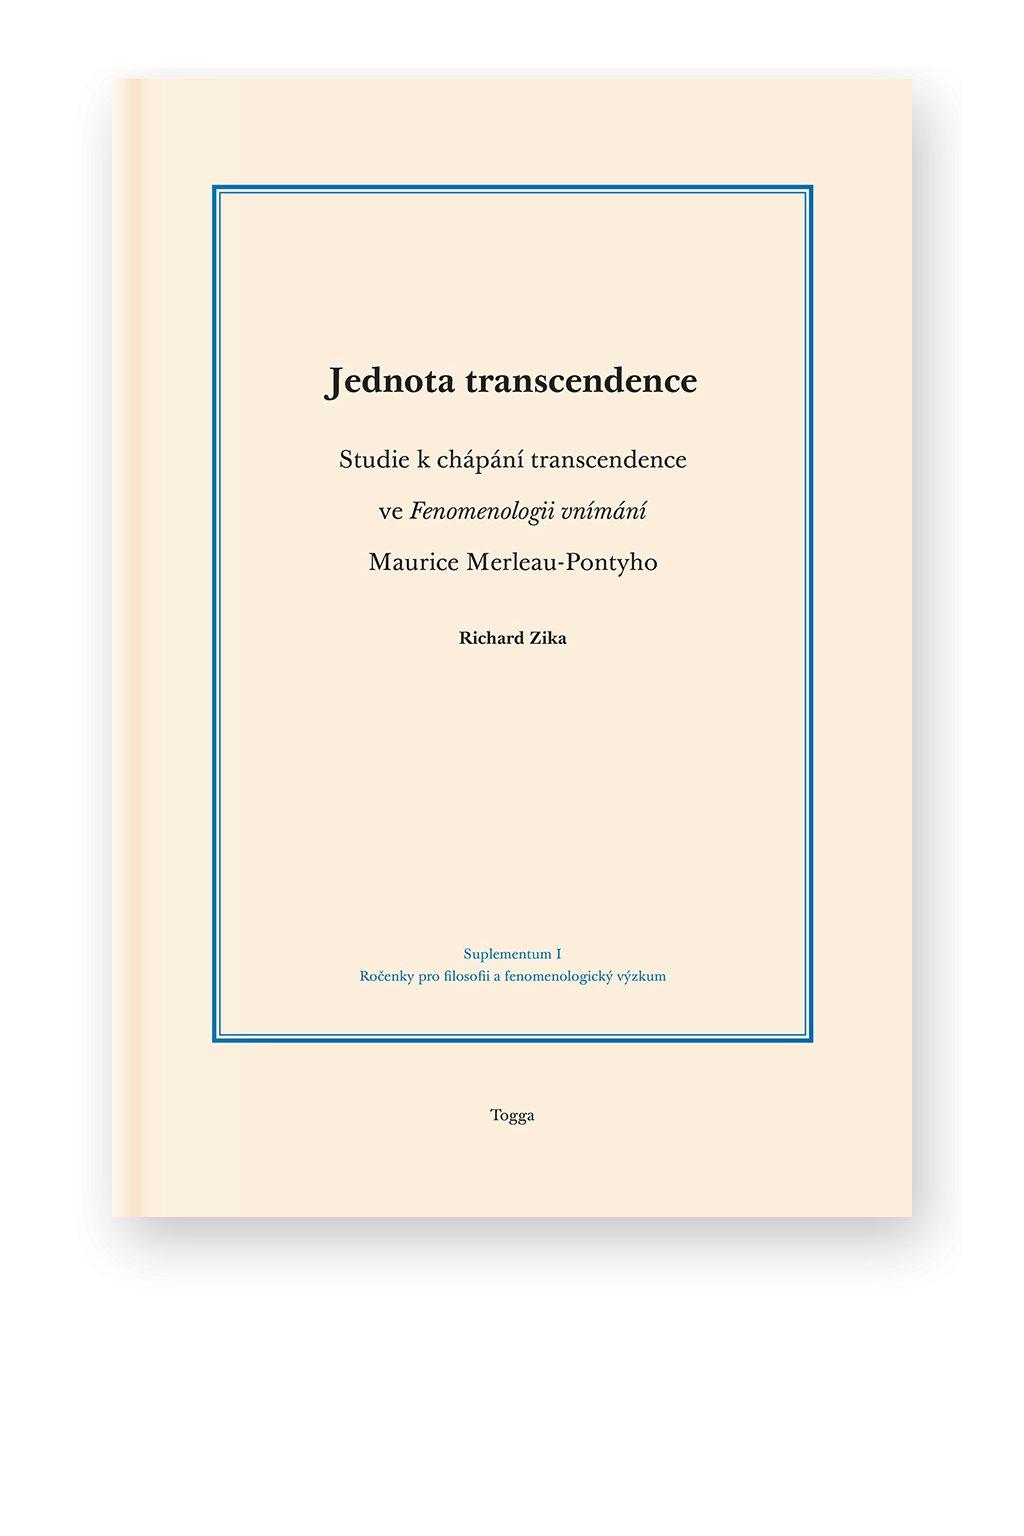 897 jednota transcendence